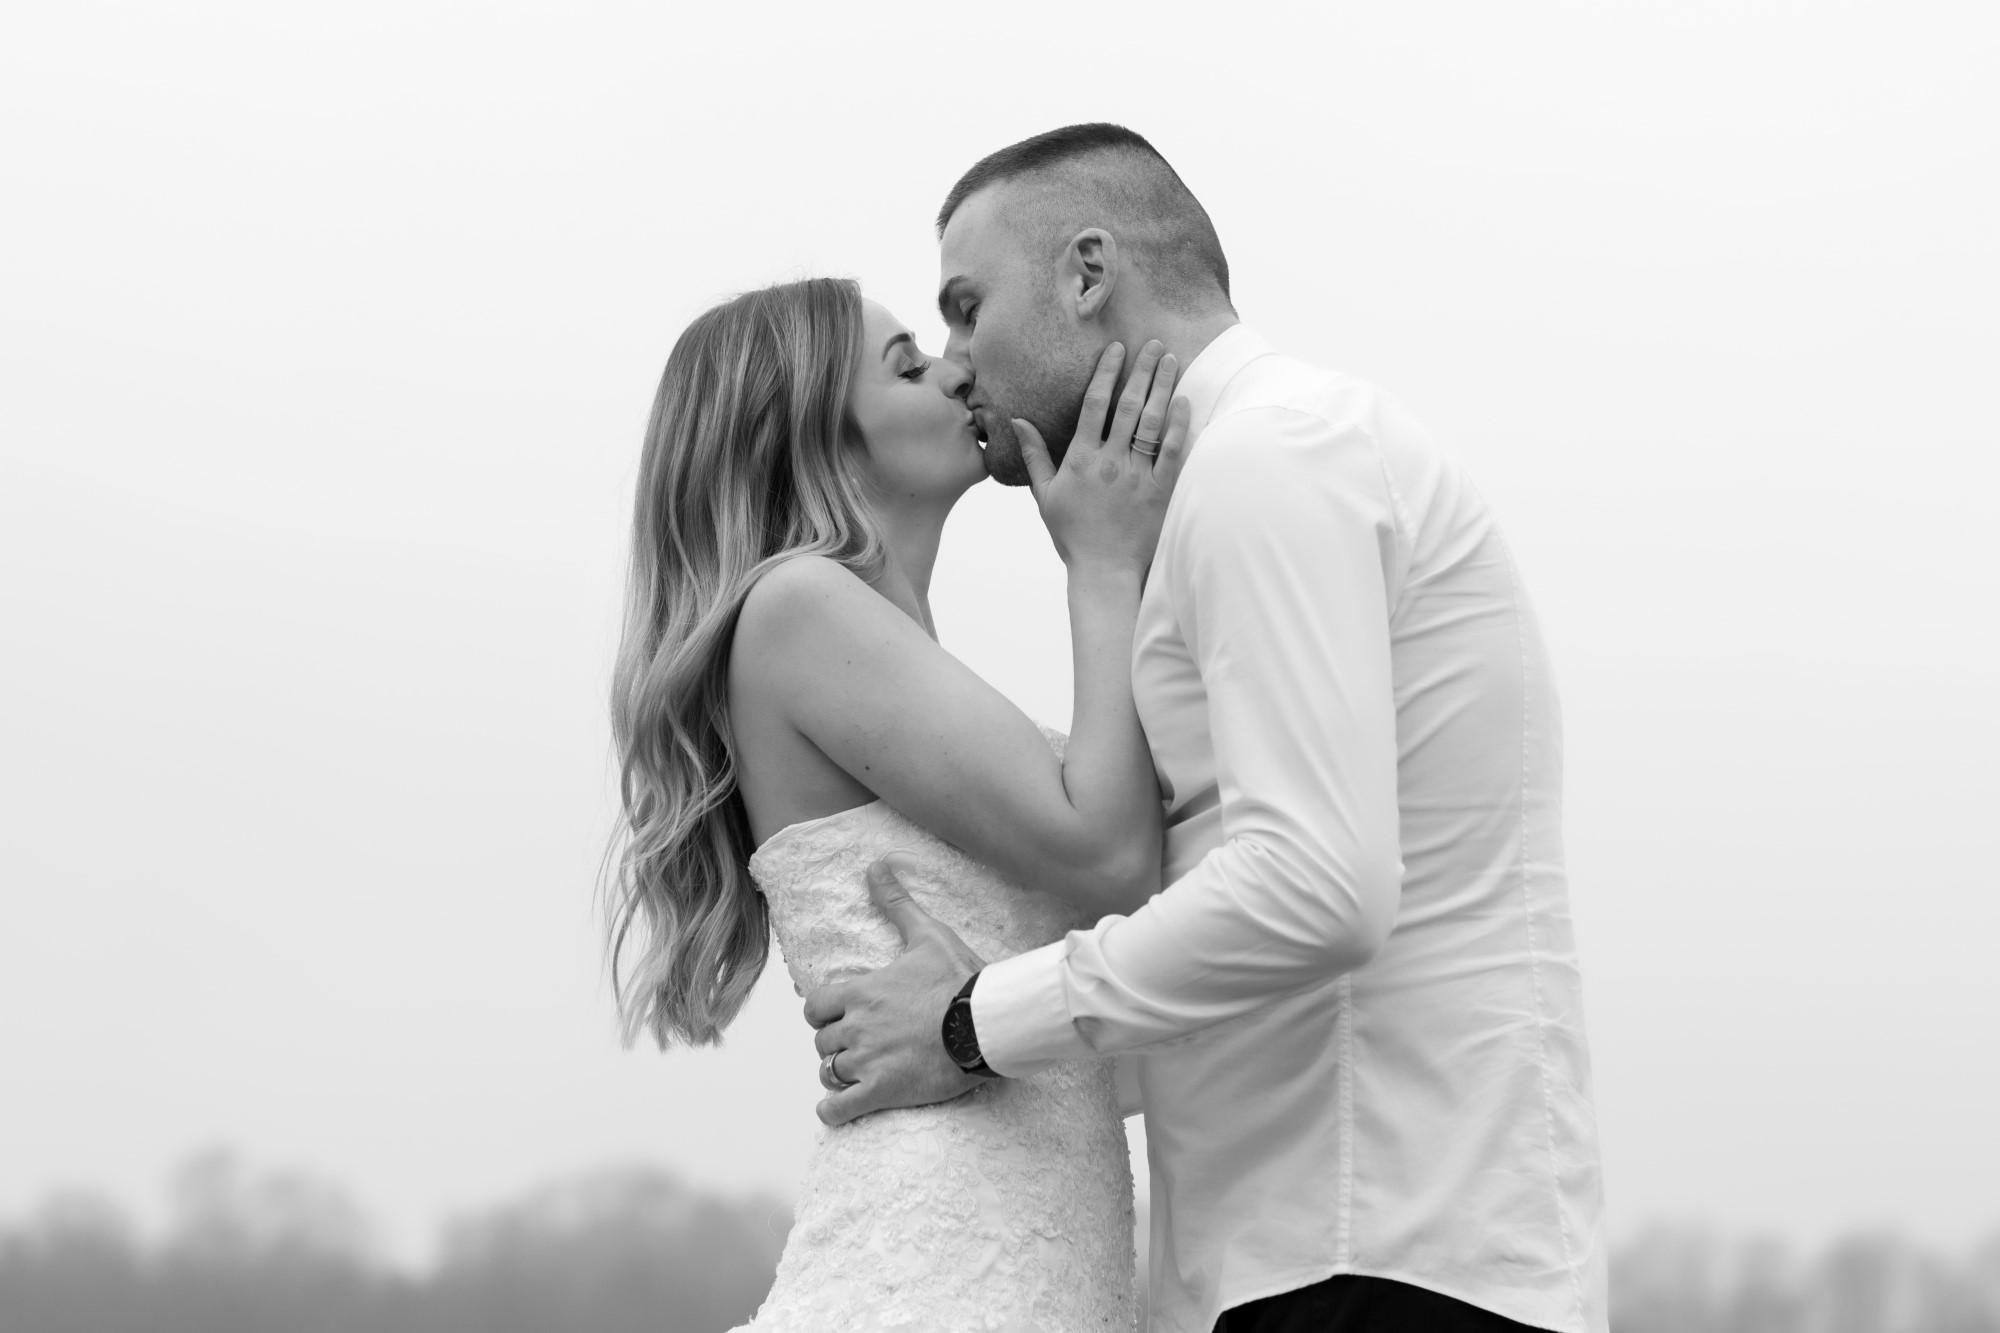 Brautpaar Kuss beim Fotoshooting